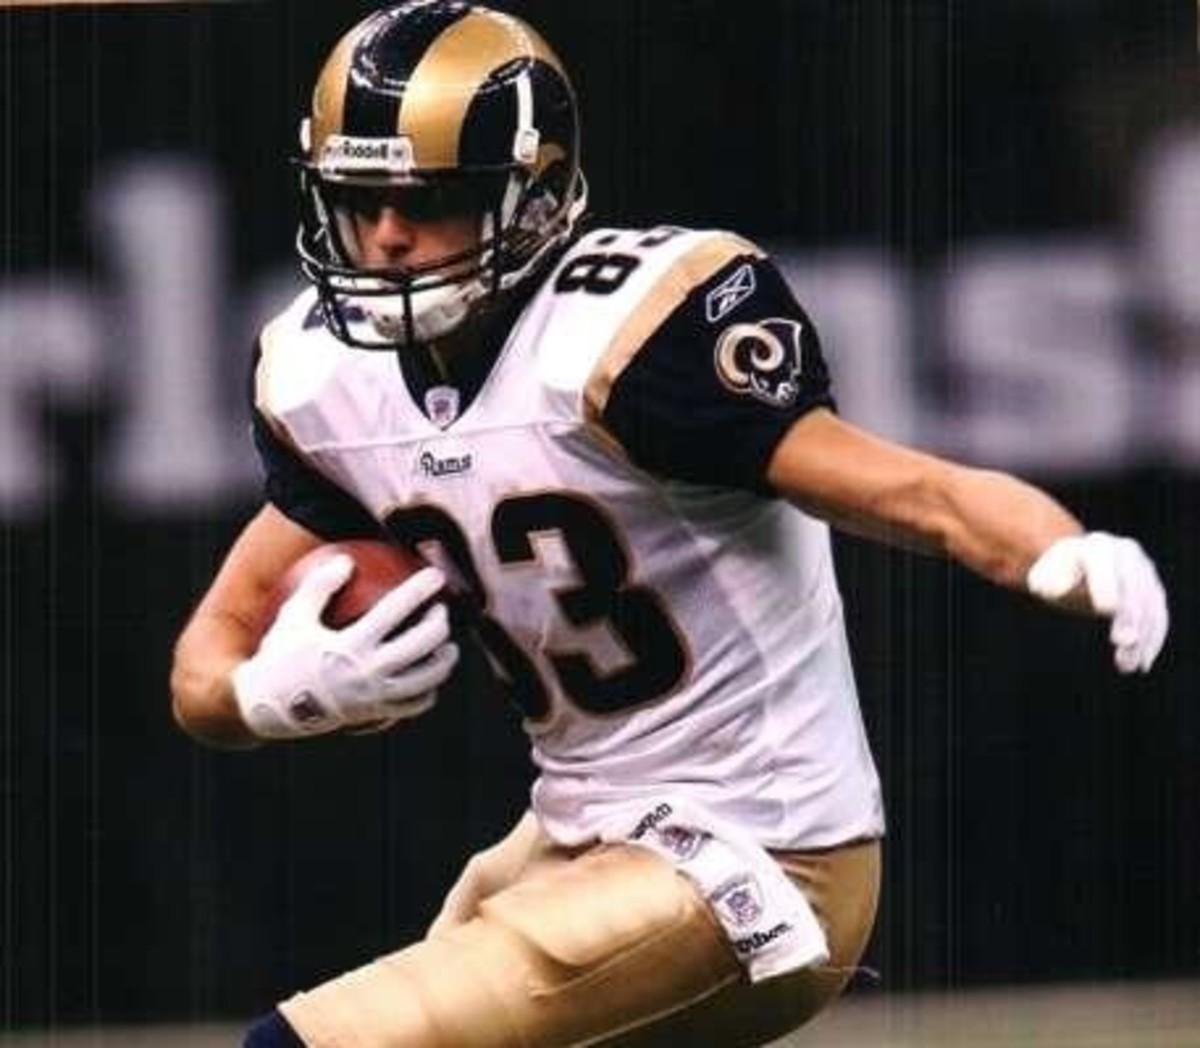 Los Angeles Rams: Drew Bennett